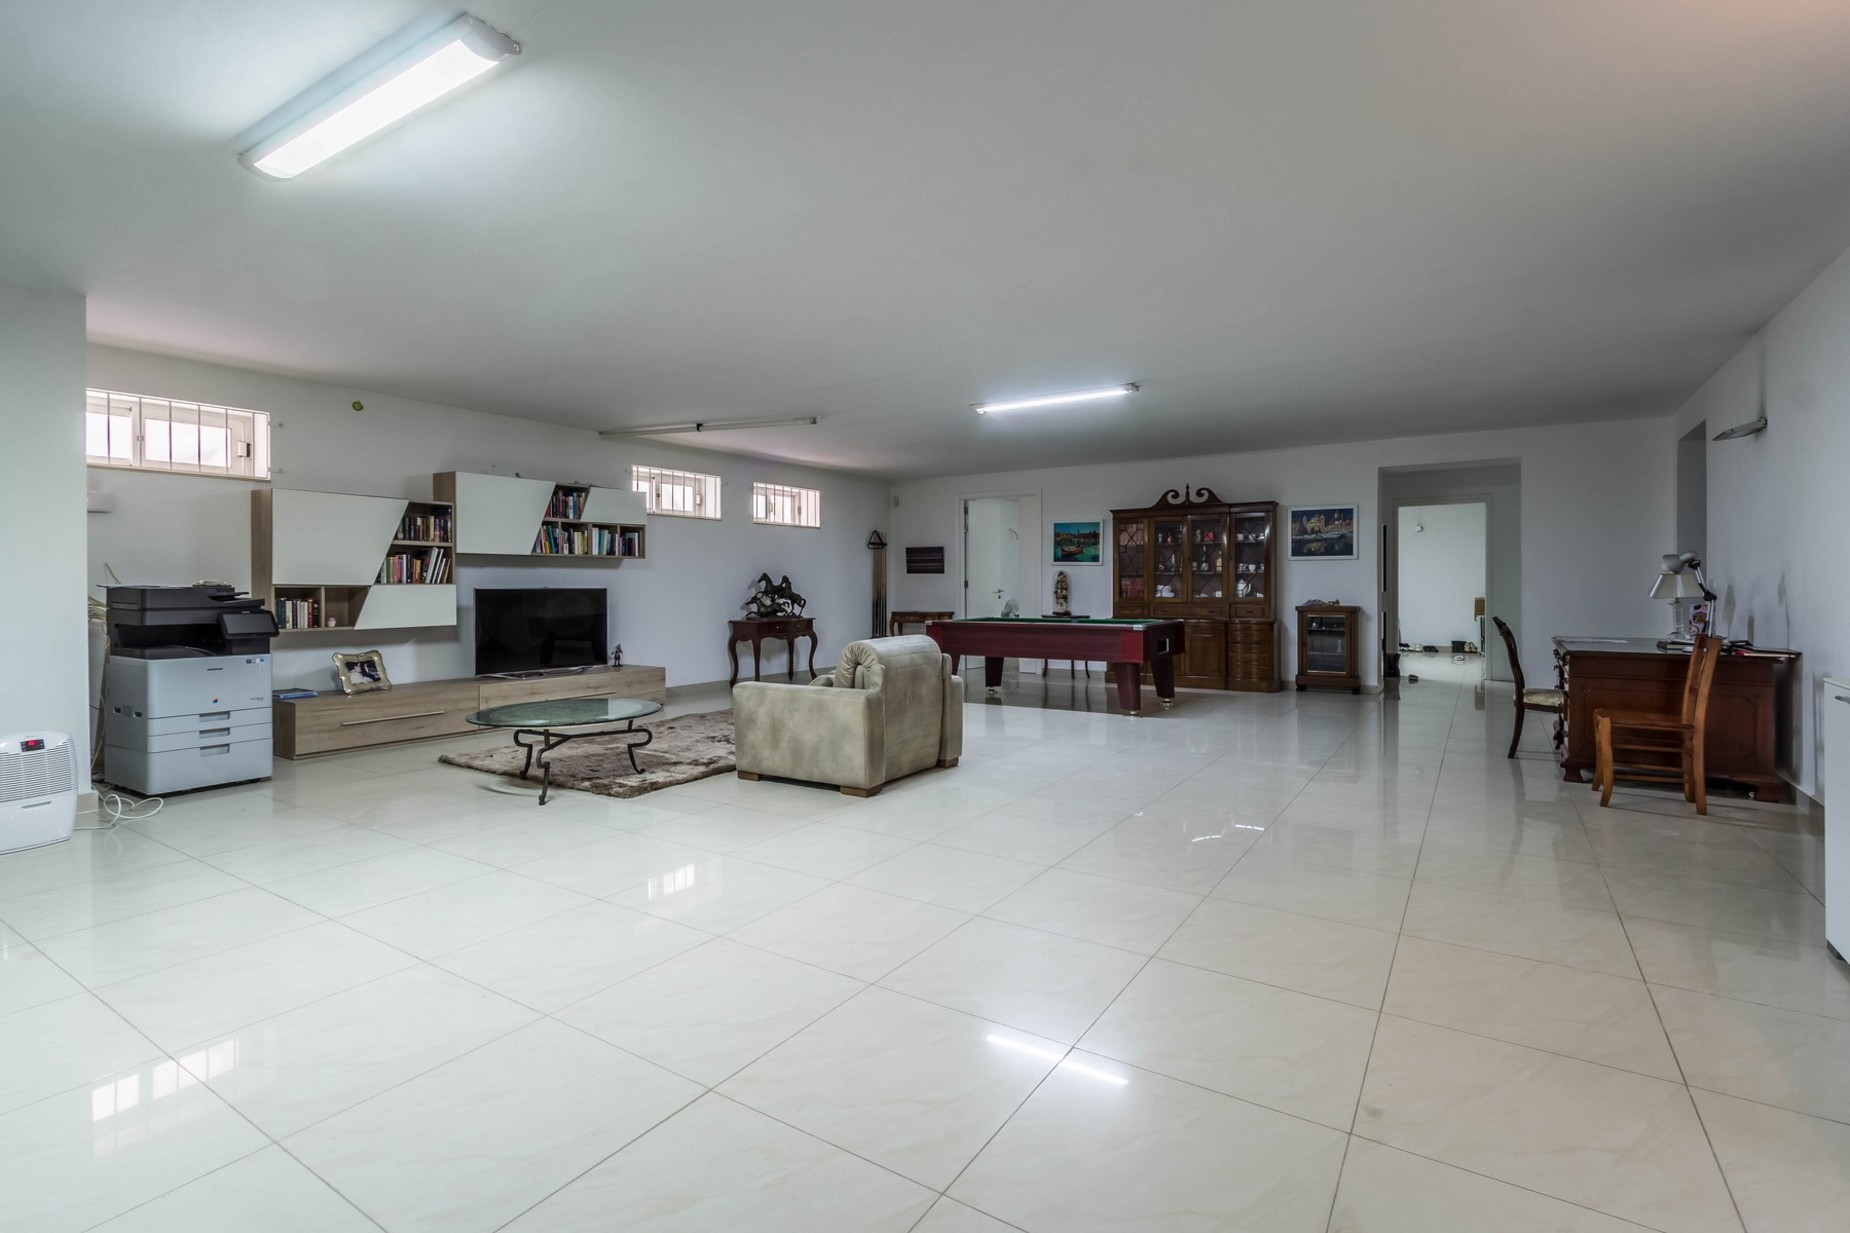 4 bed Villa For Sale in Marsascala, Marsascala - thumb 28